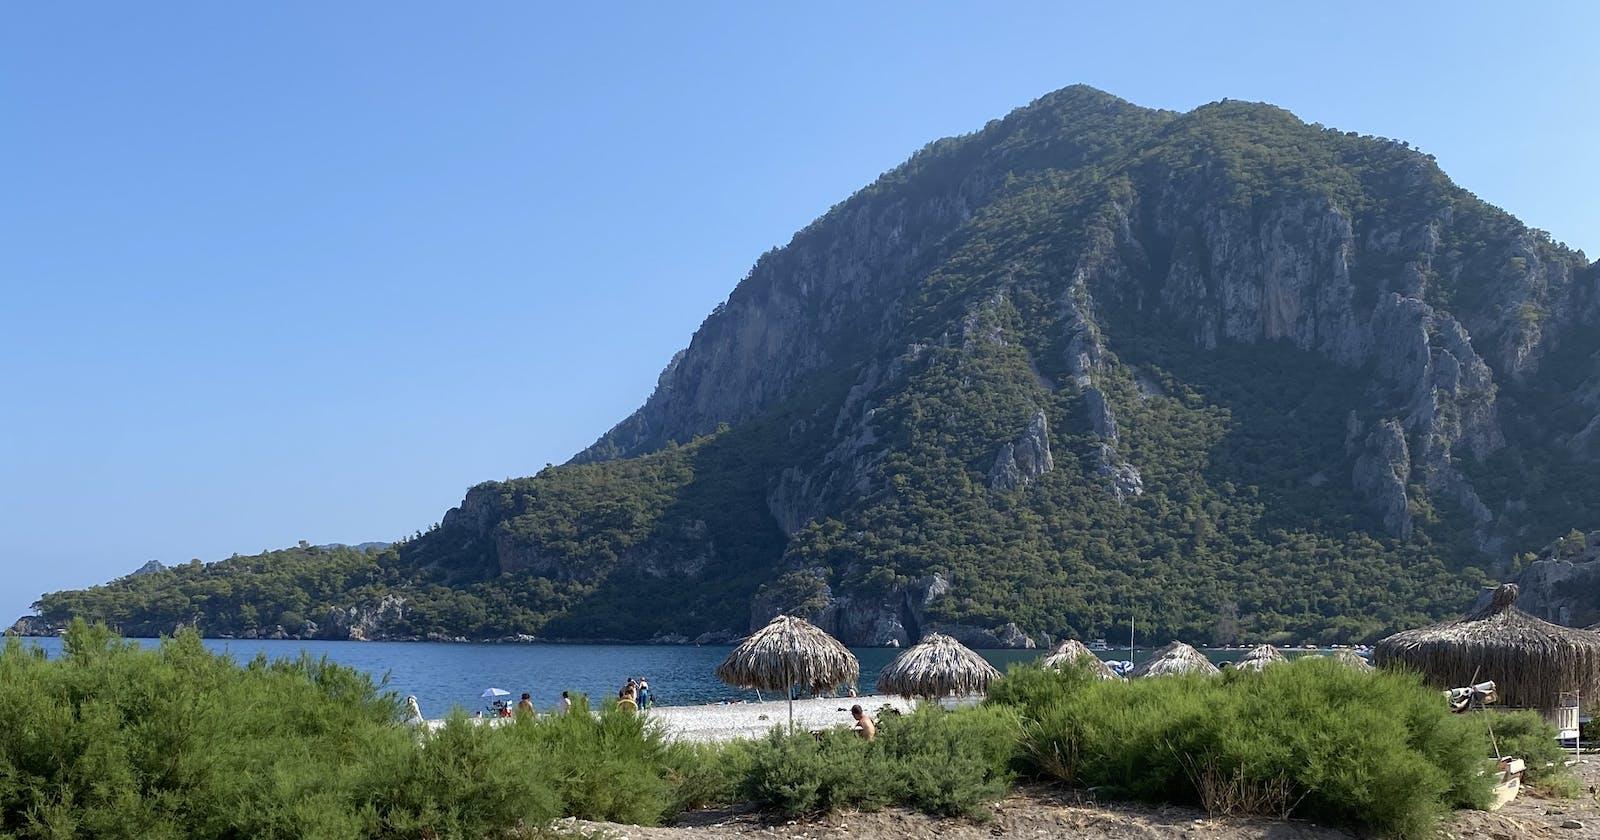 Çirali: Travel tip in soutwest Turkey